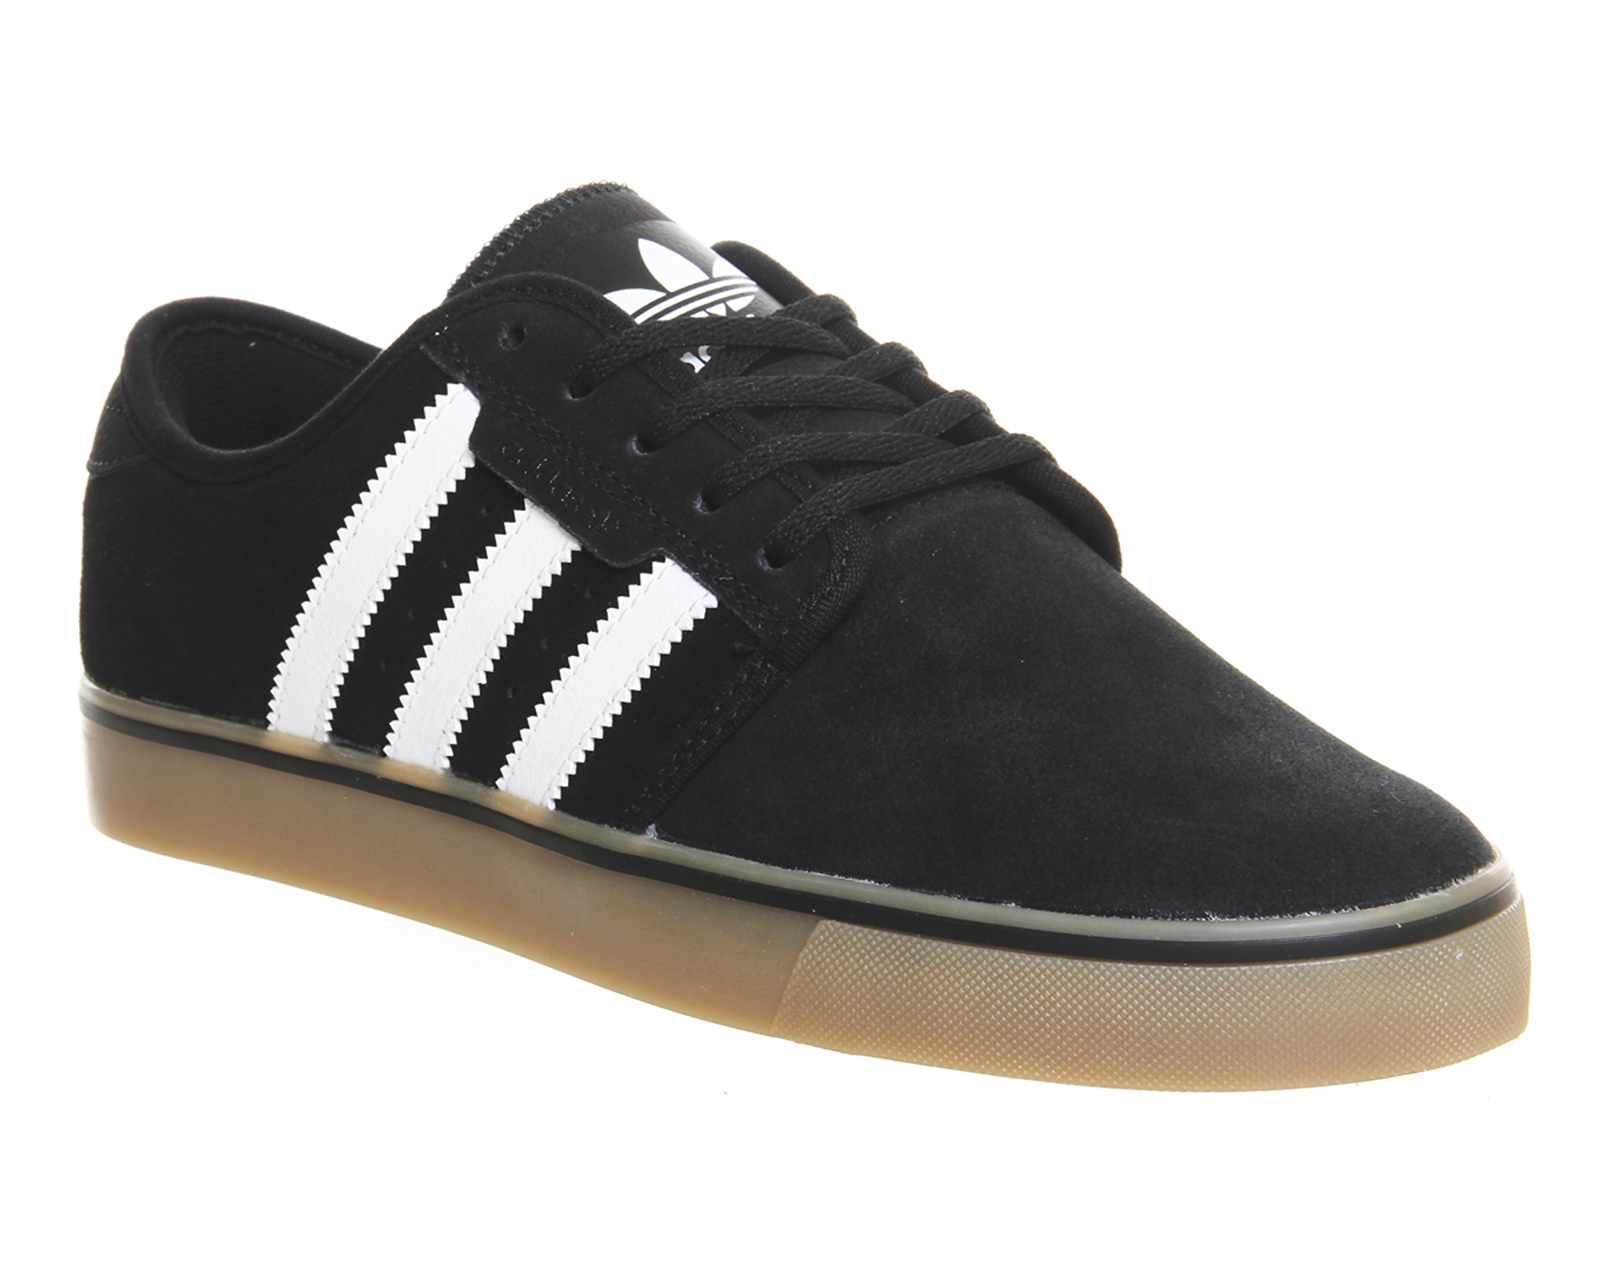 Adidas Seeley Shoes Black White Gum